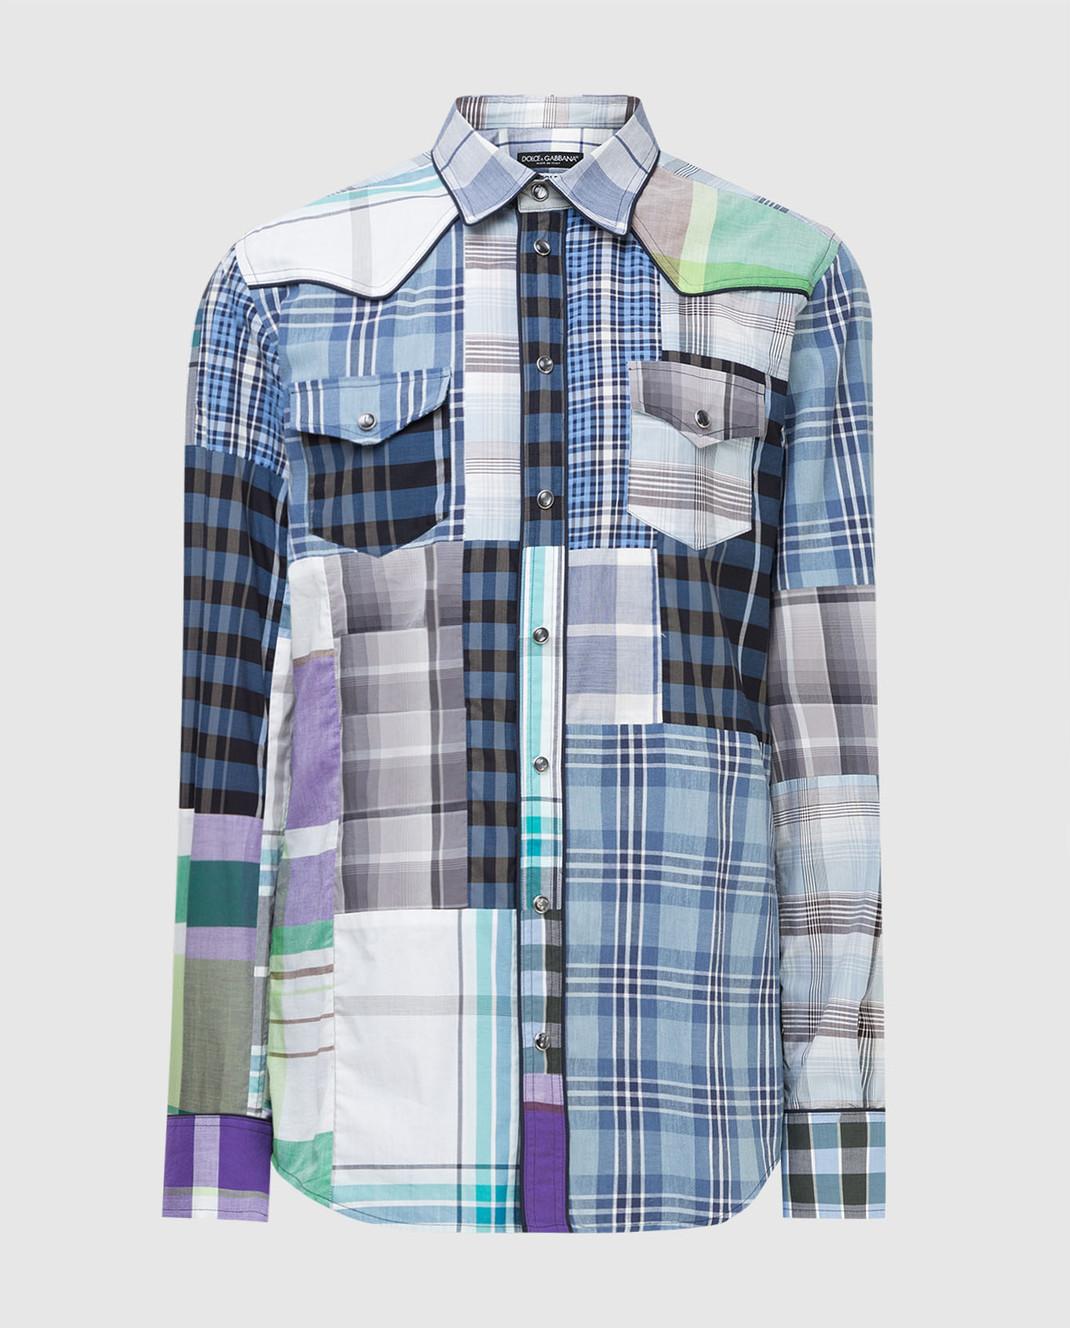 Dolce&Gabbana Синяя рубашка изображение 1